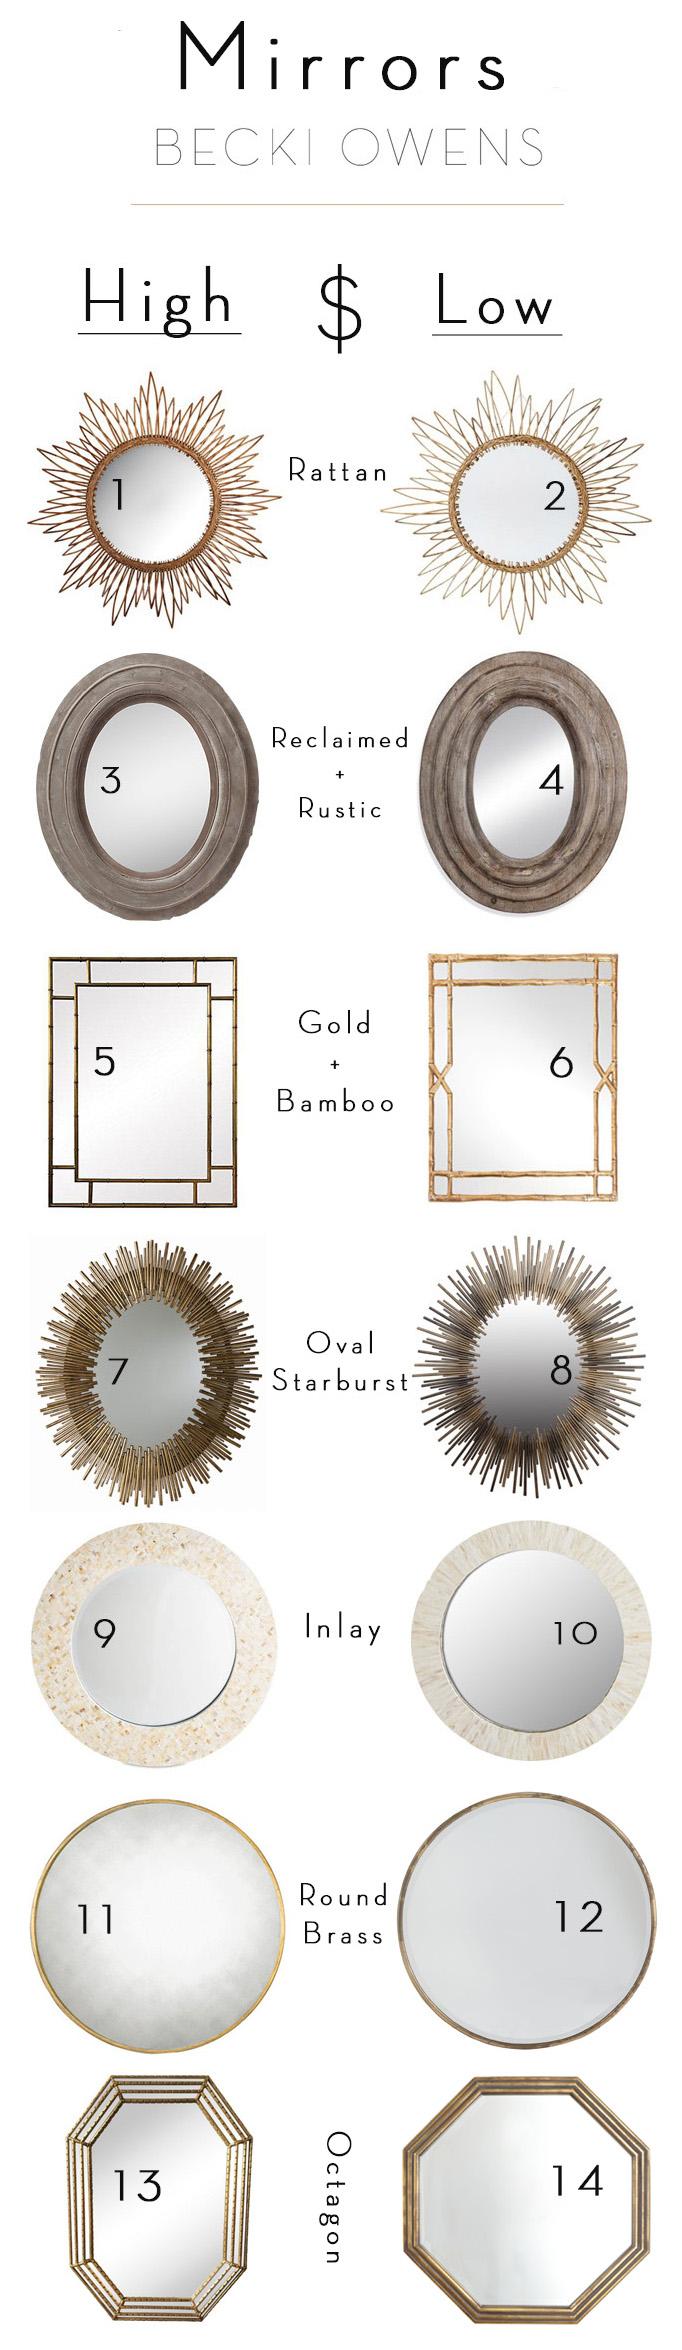 splurge and save mirrors becki owens